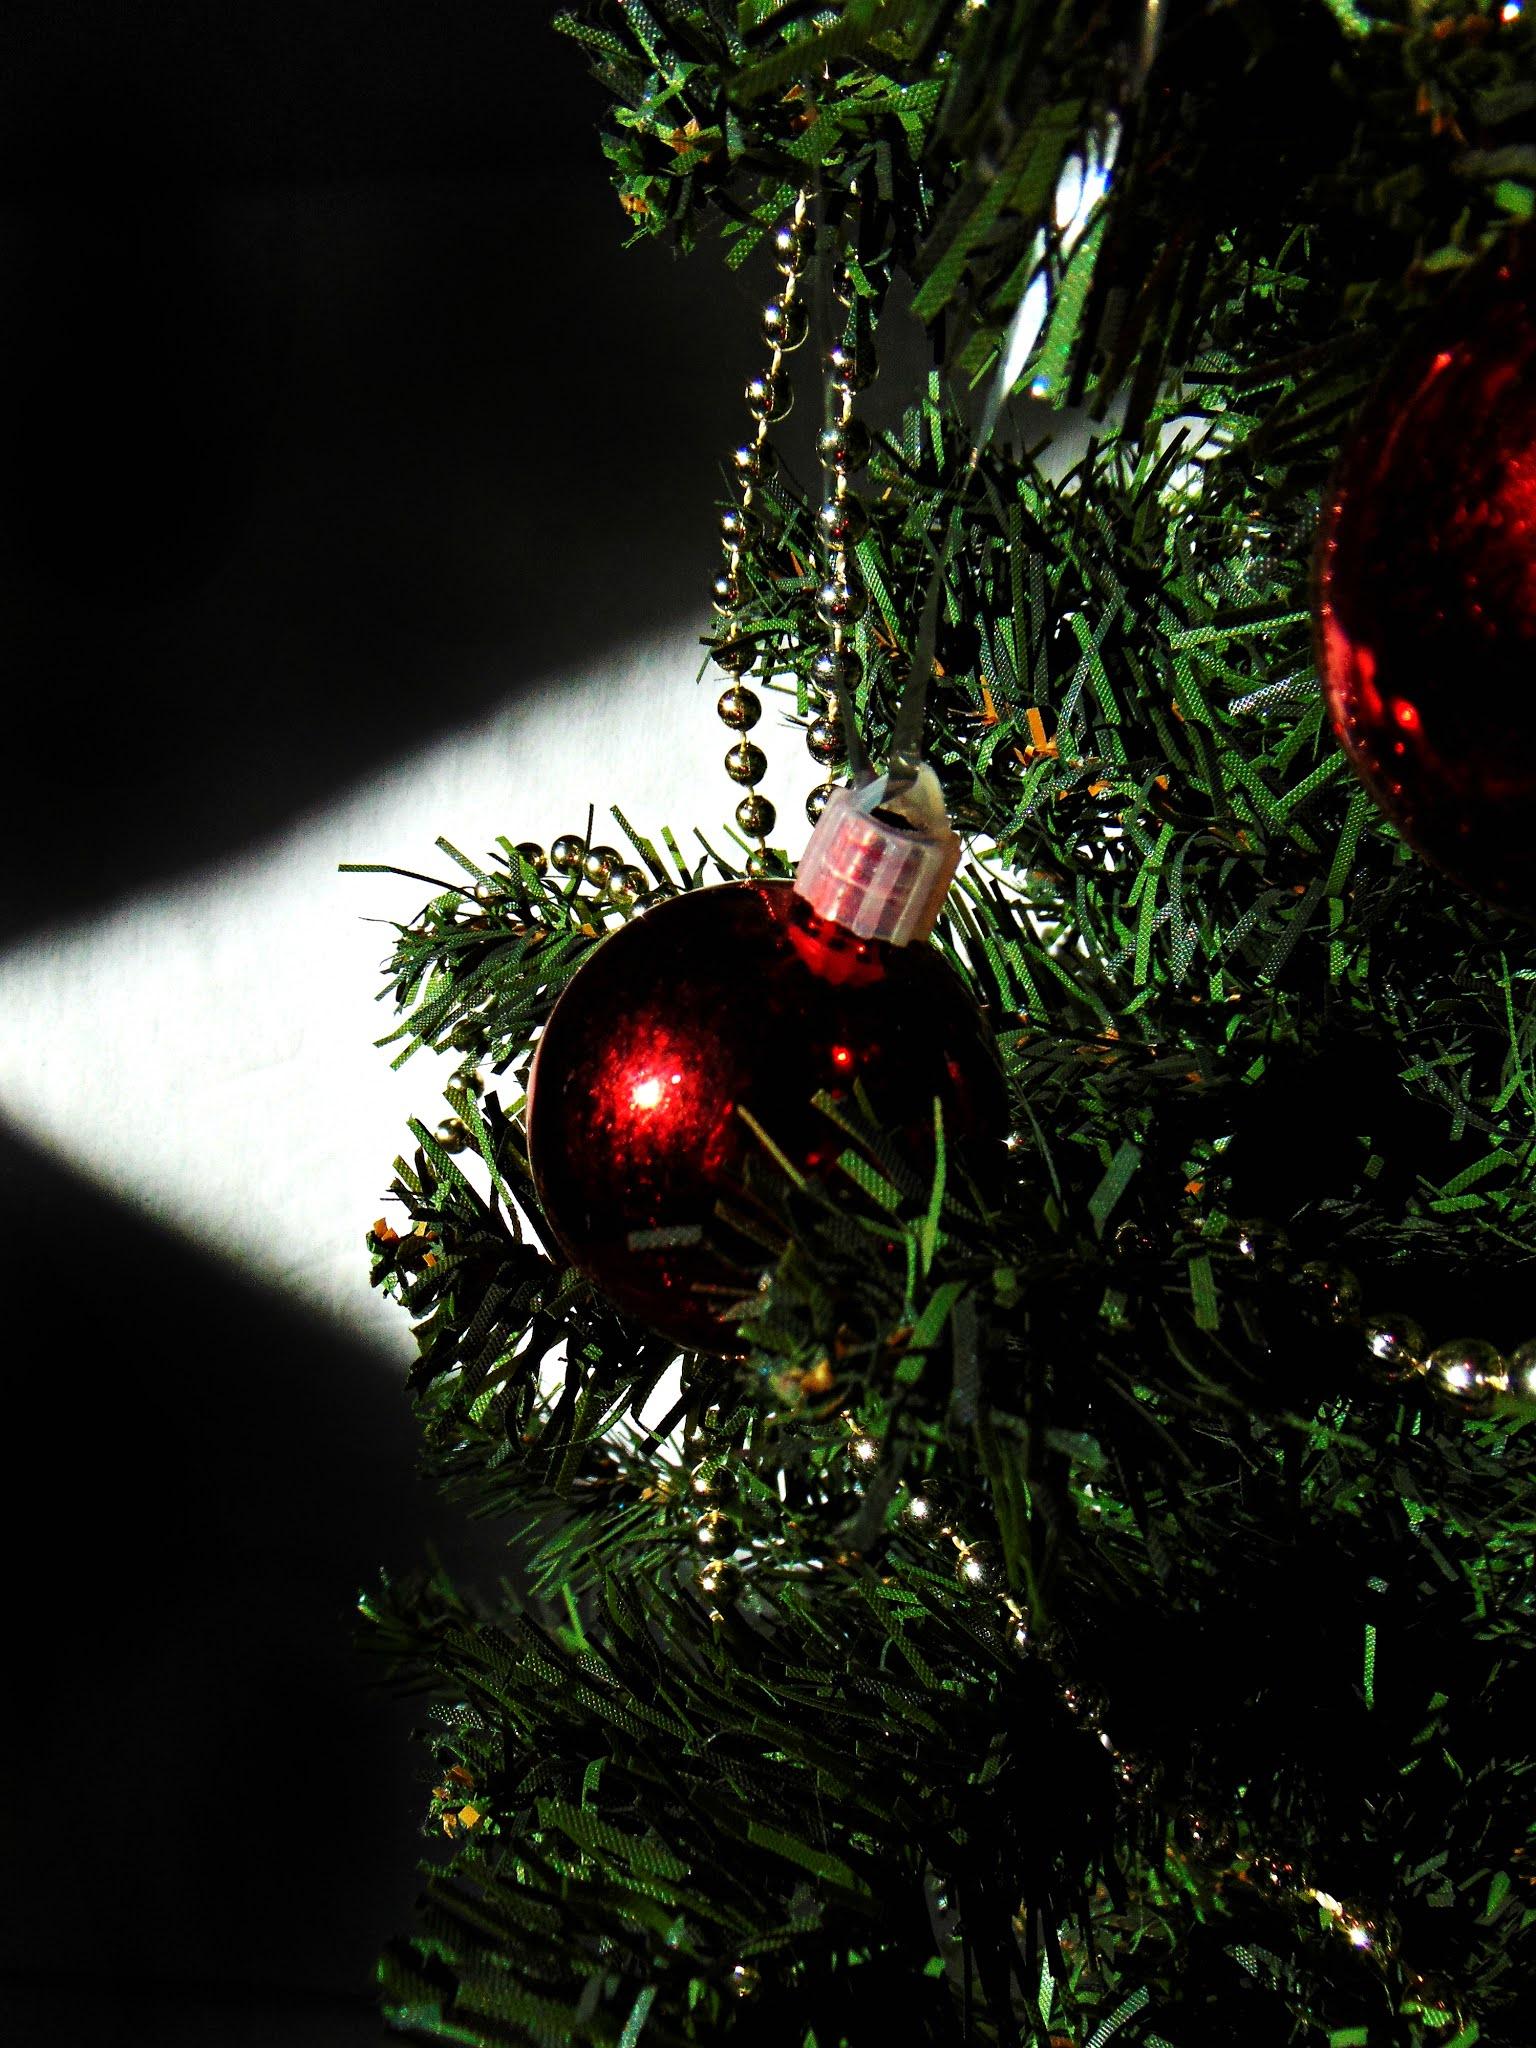 How to get into Christmas spirit